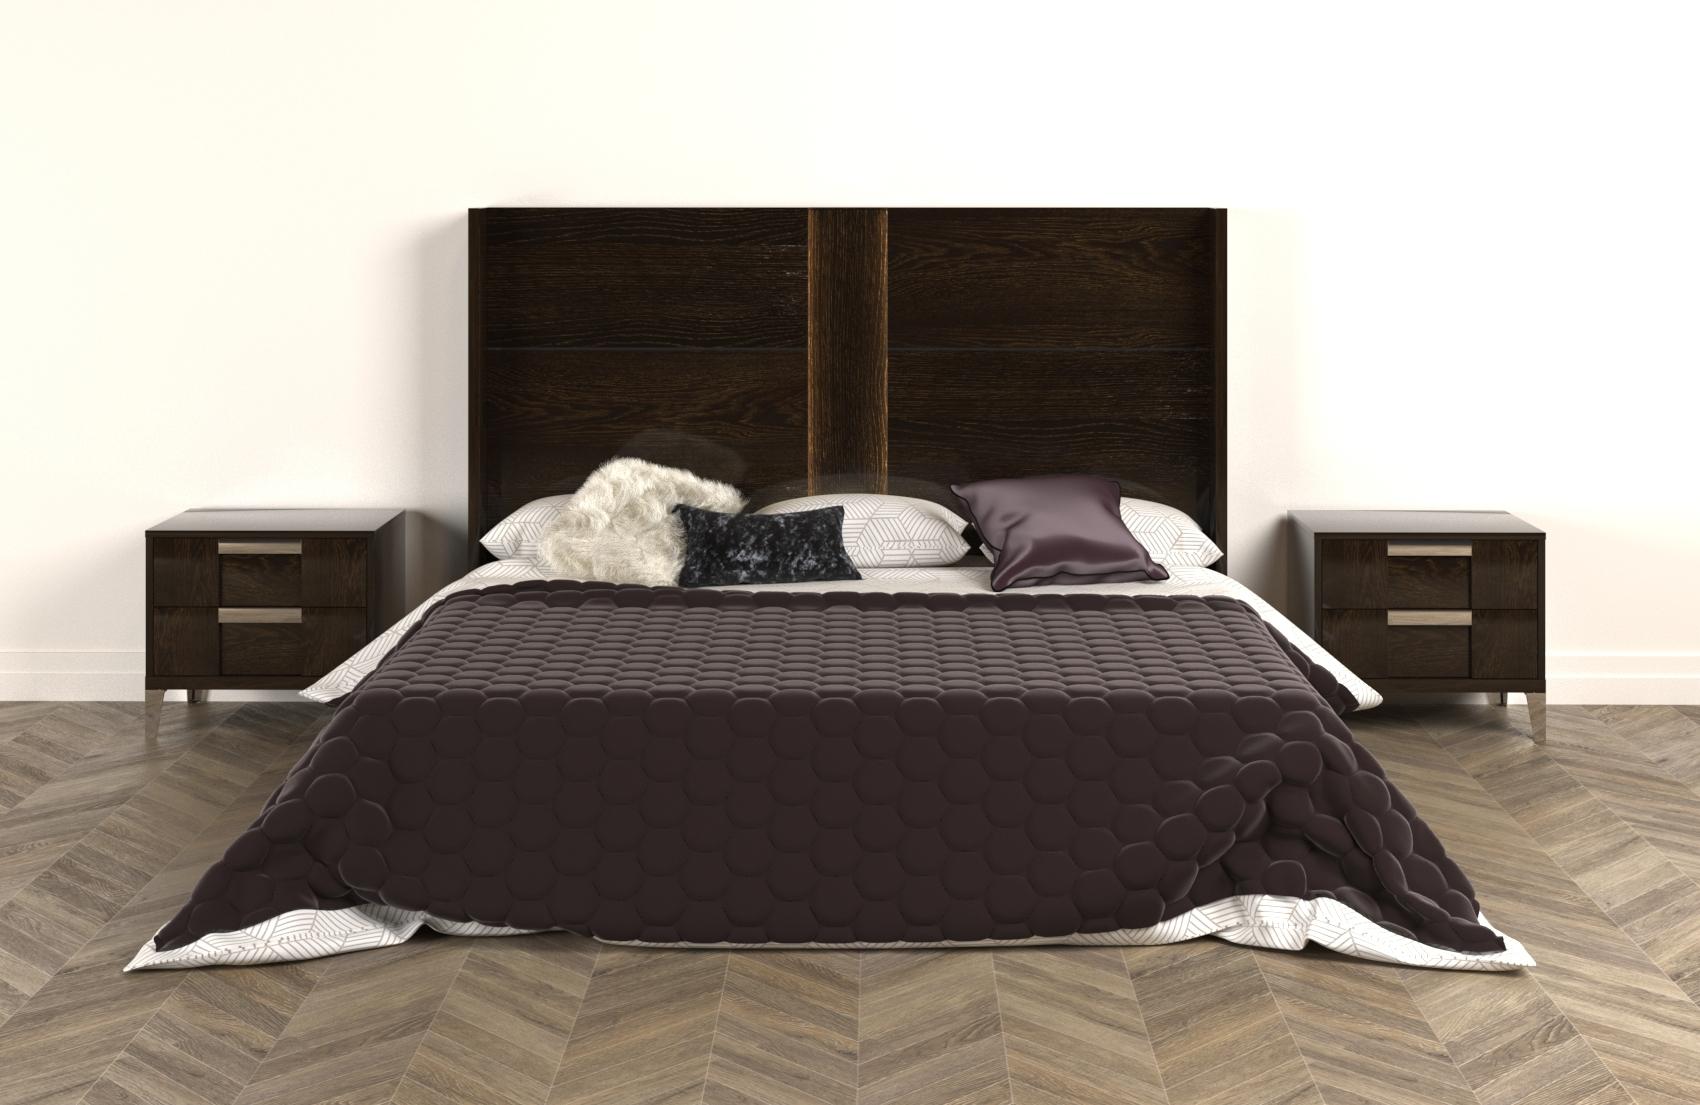 Full Size of Kingsize Bett Alf Soprano 3d Modell Turbosquid 1379806 120x200 Tatami Boxspring Landhausstil Betten Mit Bettkasten Halbhohes Kopfteil 140 Einfaches Bett Kingsize Bett